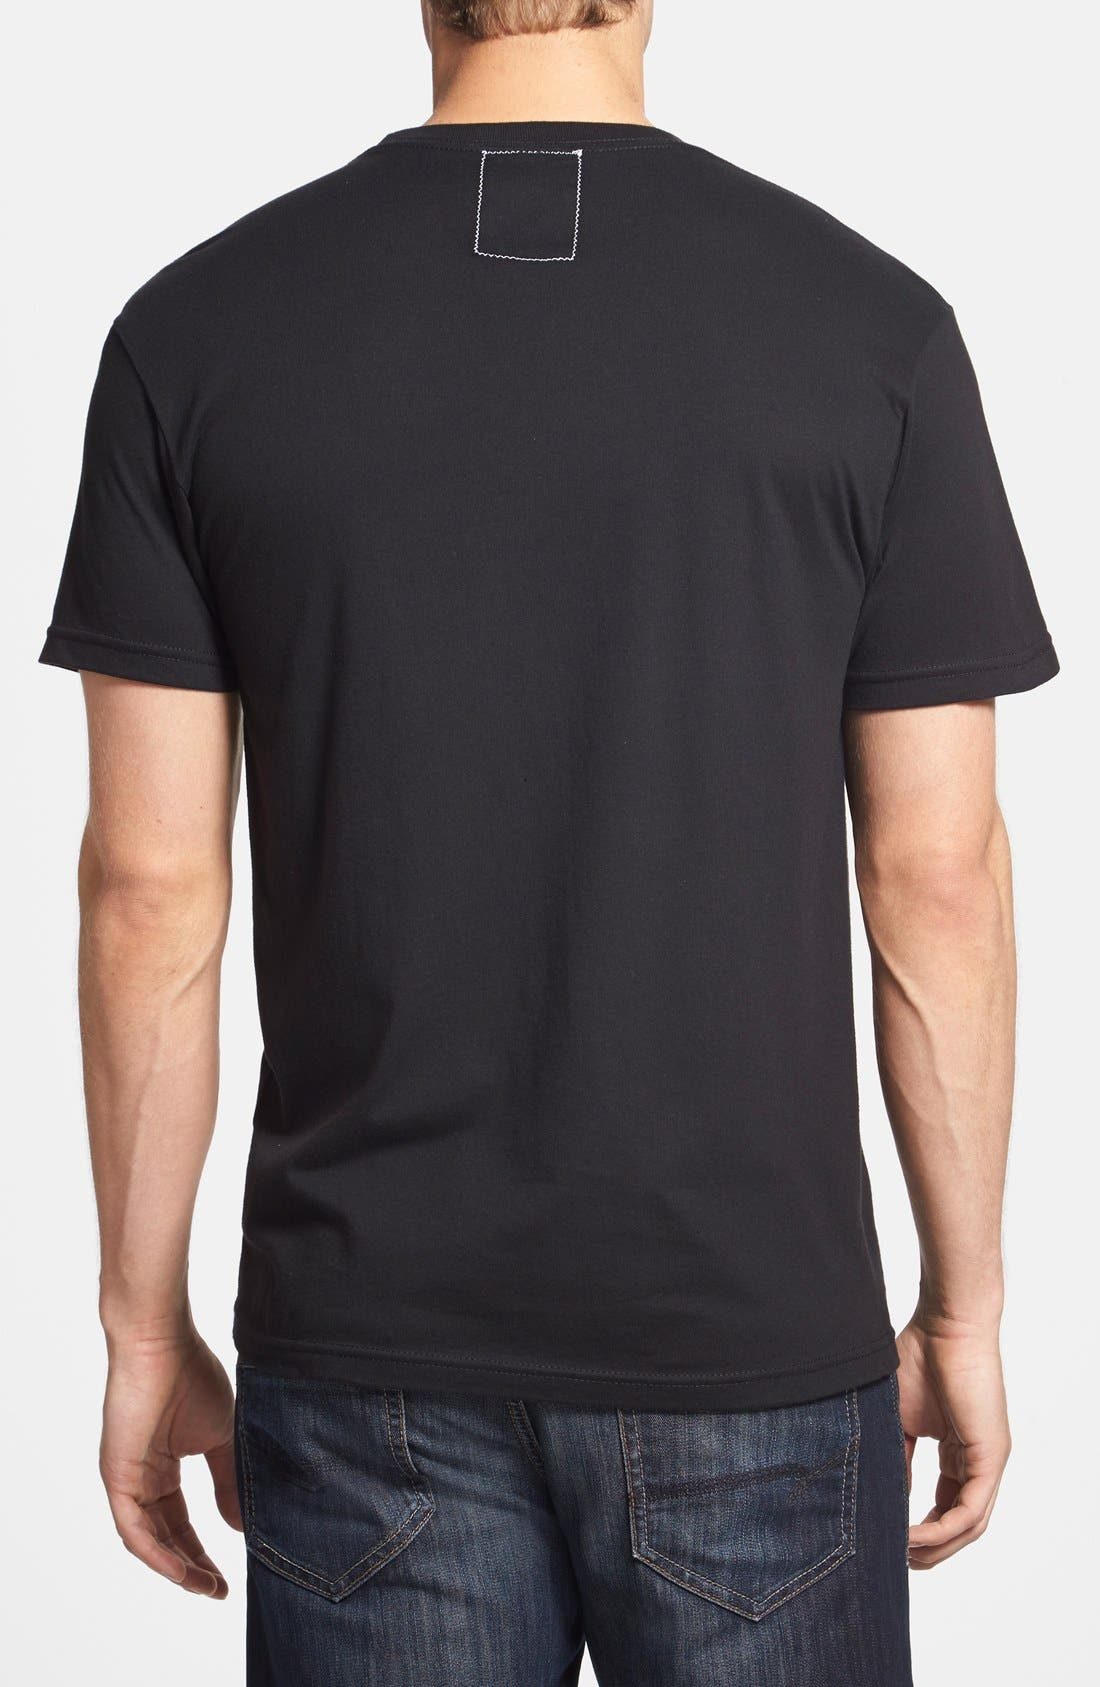 Alternate Image 2  - Kid Dangerous 'Sunday Funday Football' Slim Fit T-Shirt (Online Only)